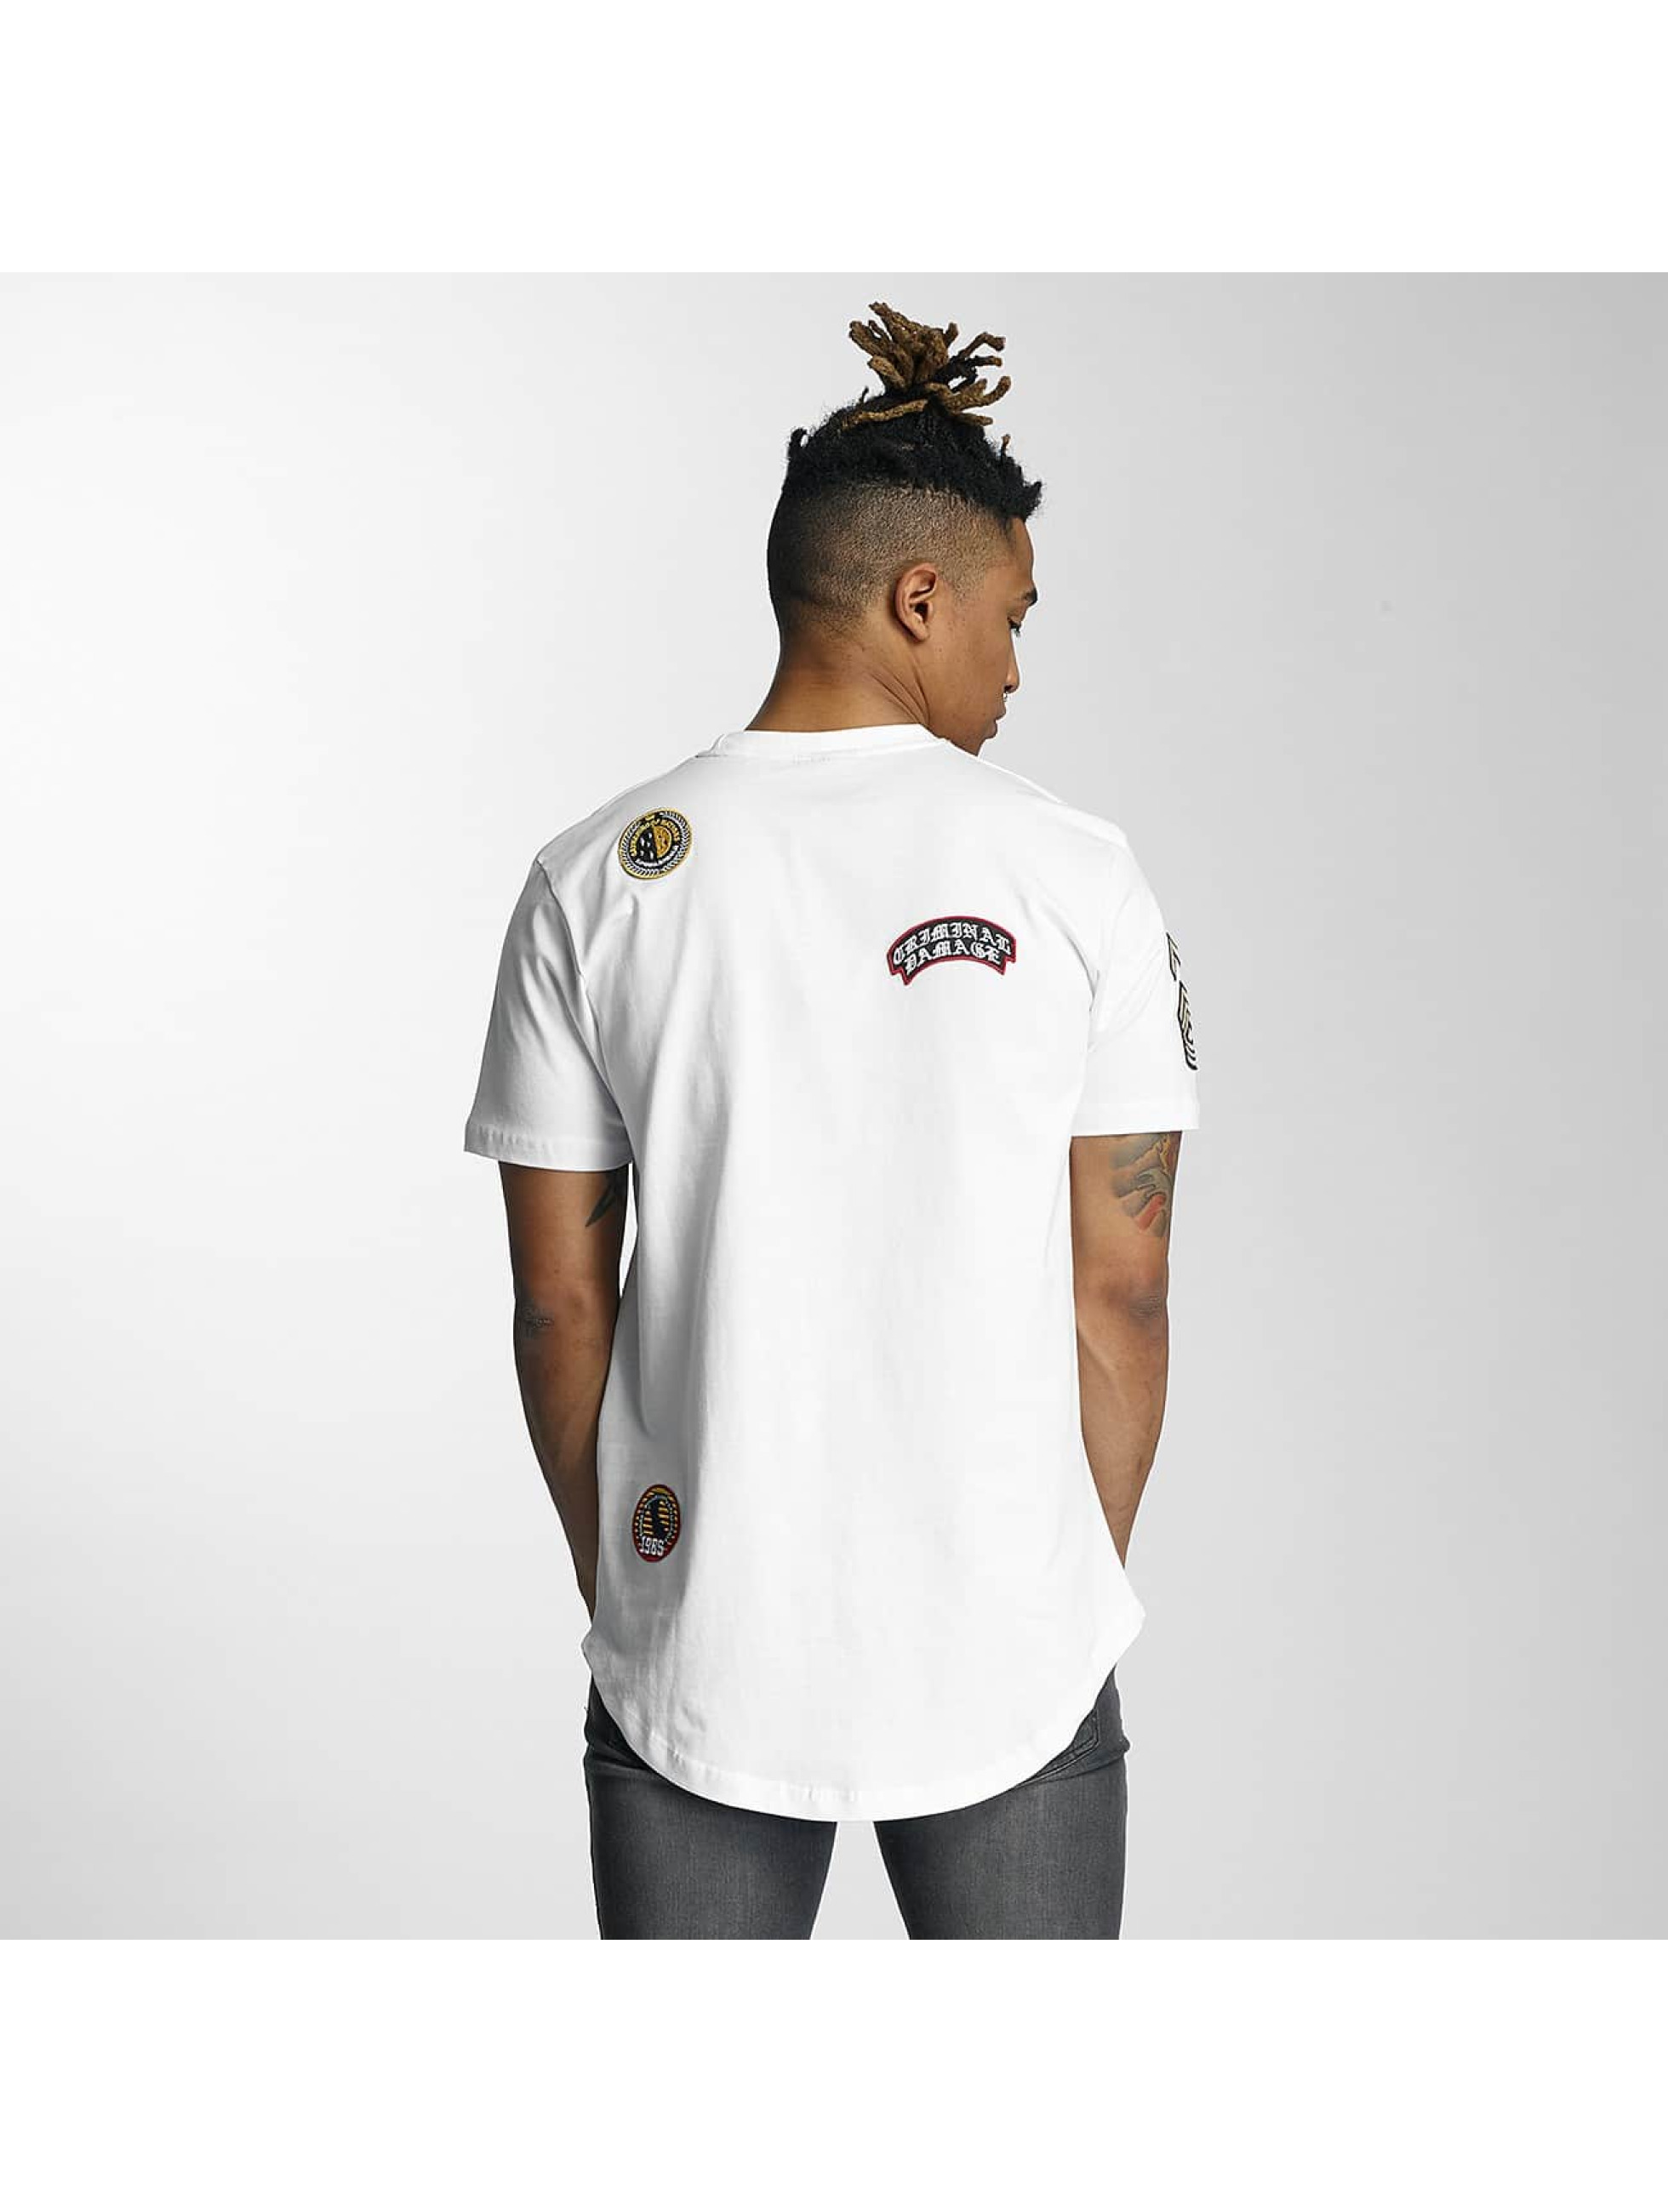 Criminal-Damage-Uomini-Maglieria-T-shirt-Emblem